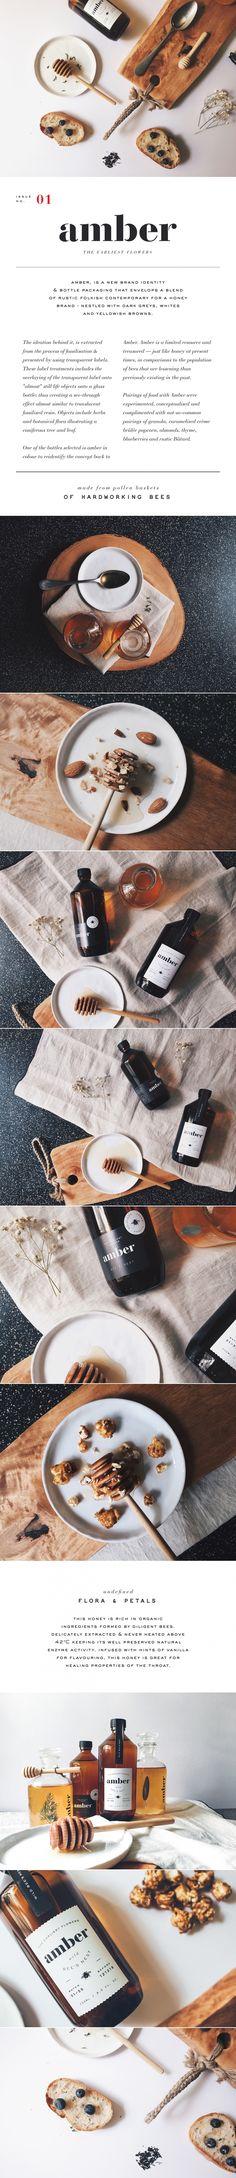 Amber design & brand